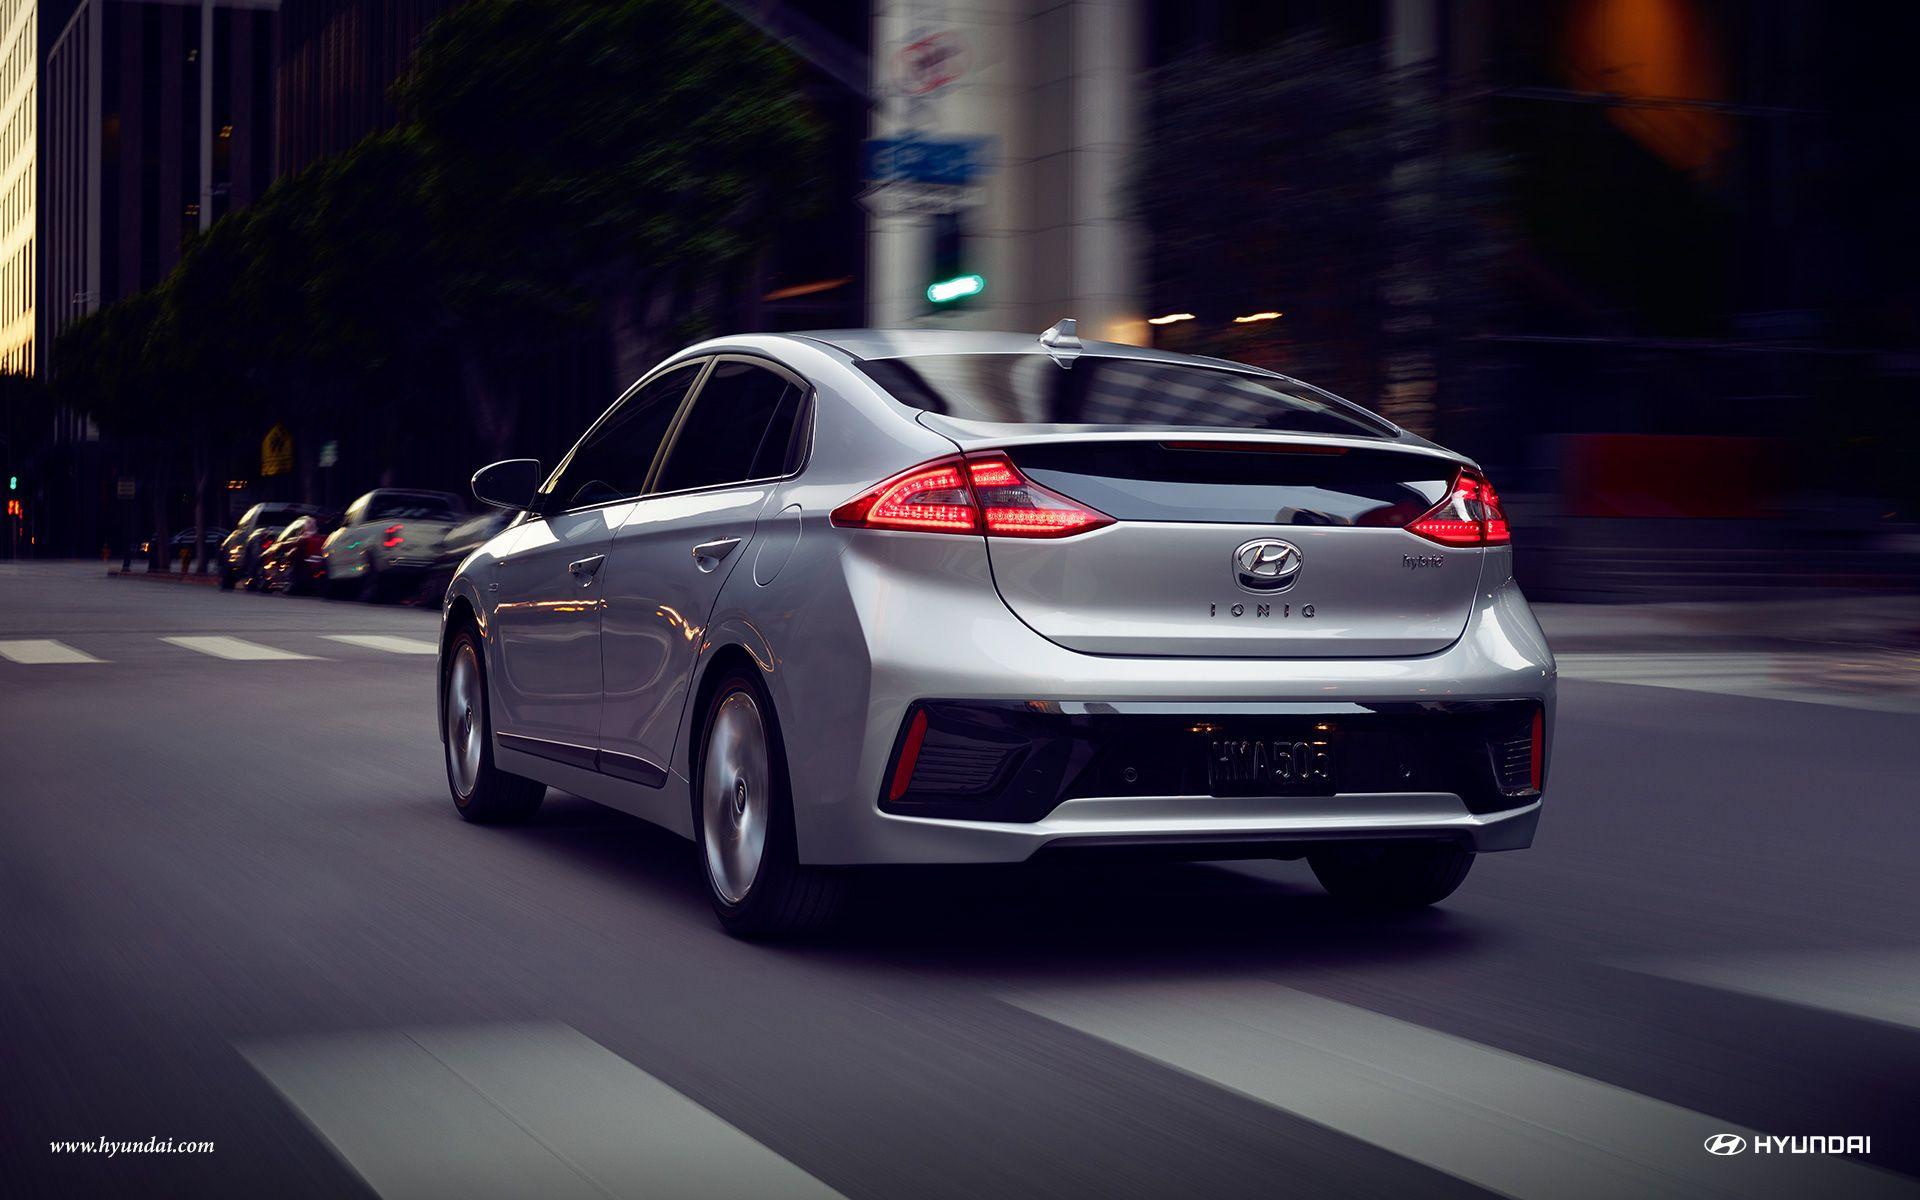 The New Ioniq One Car Three Options Hyundai Cars Hyundai Hyundai Dealership